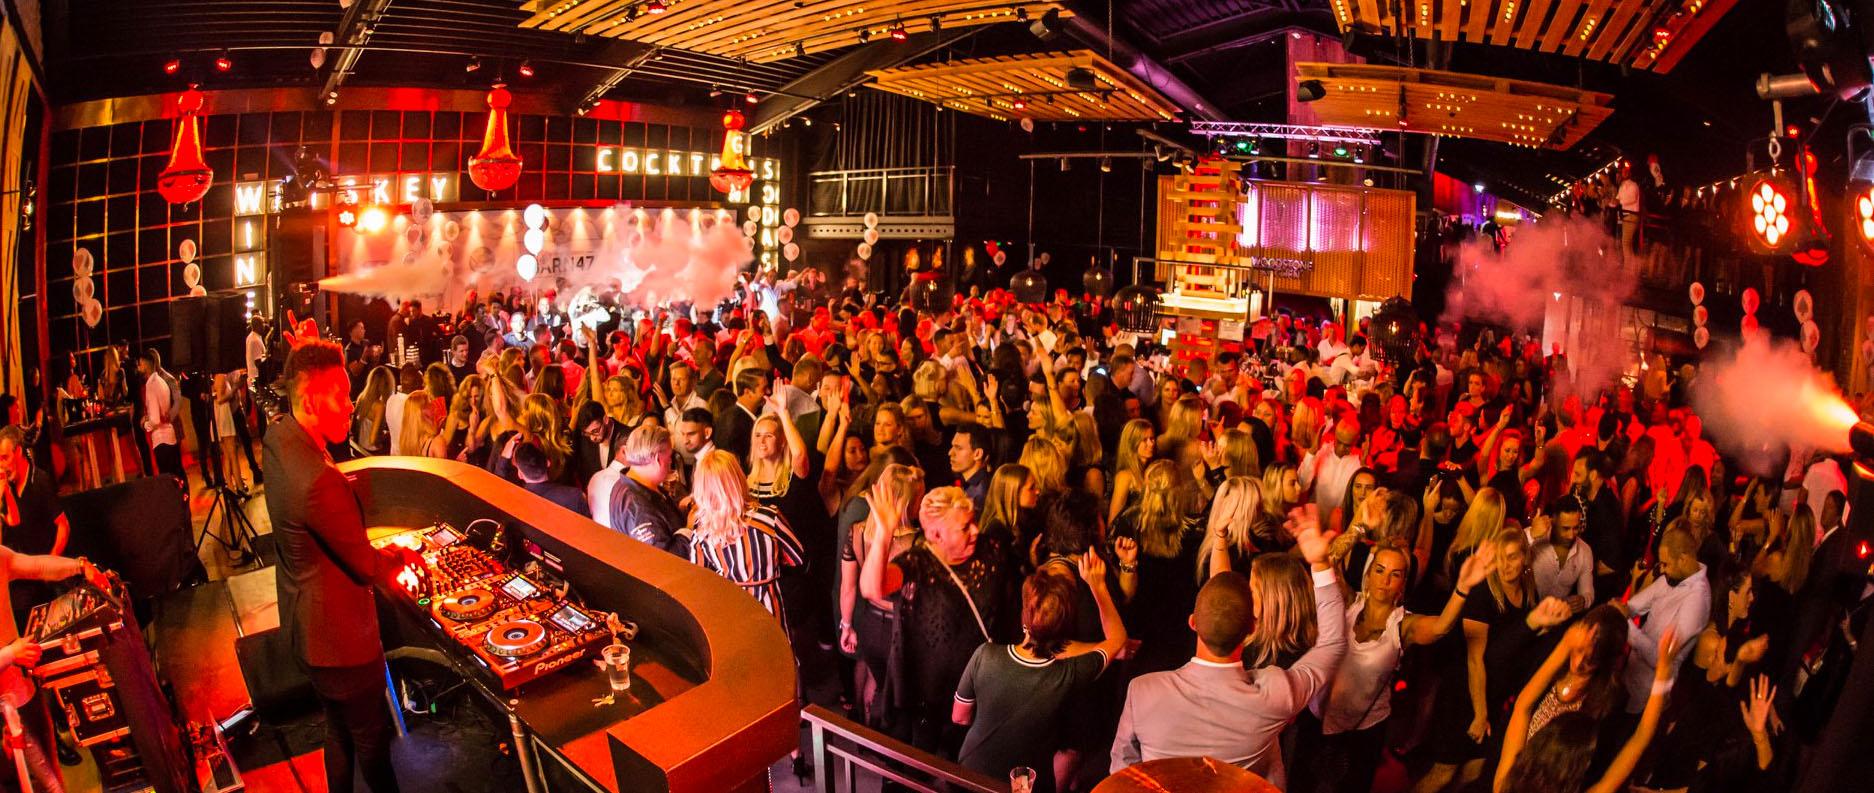 Upcoming Events Barn47 Den Haag